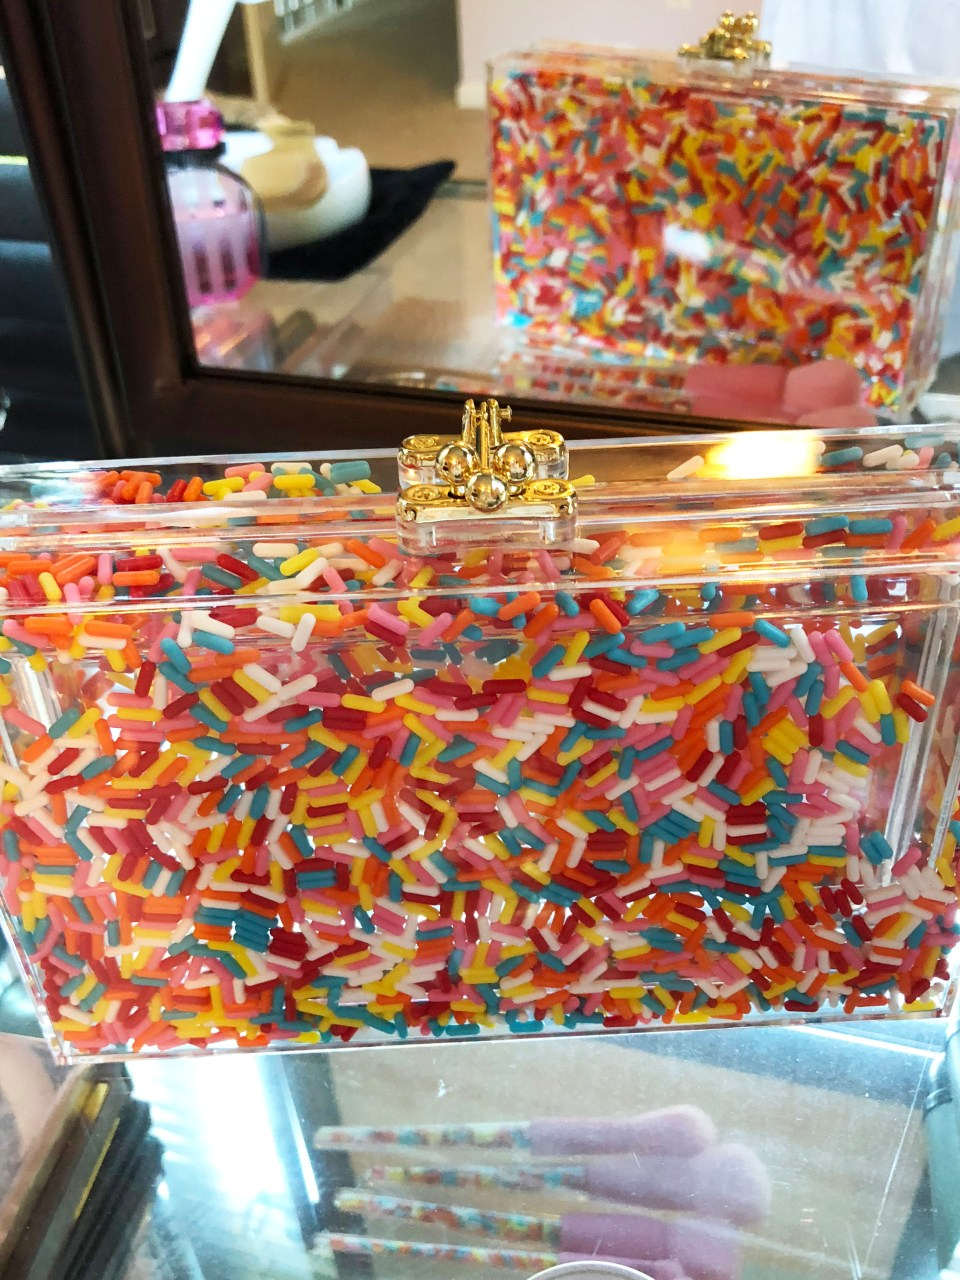 Museum of Ice Cream x Sephora - Sprinkle Clutch